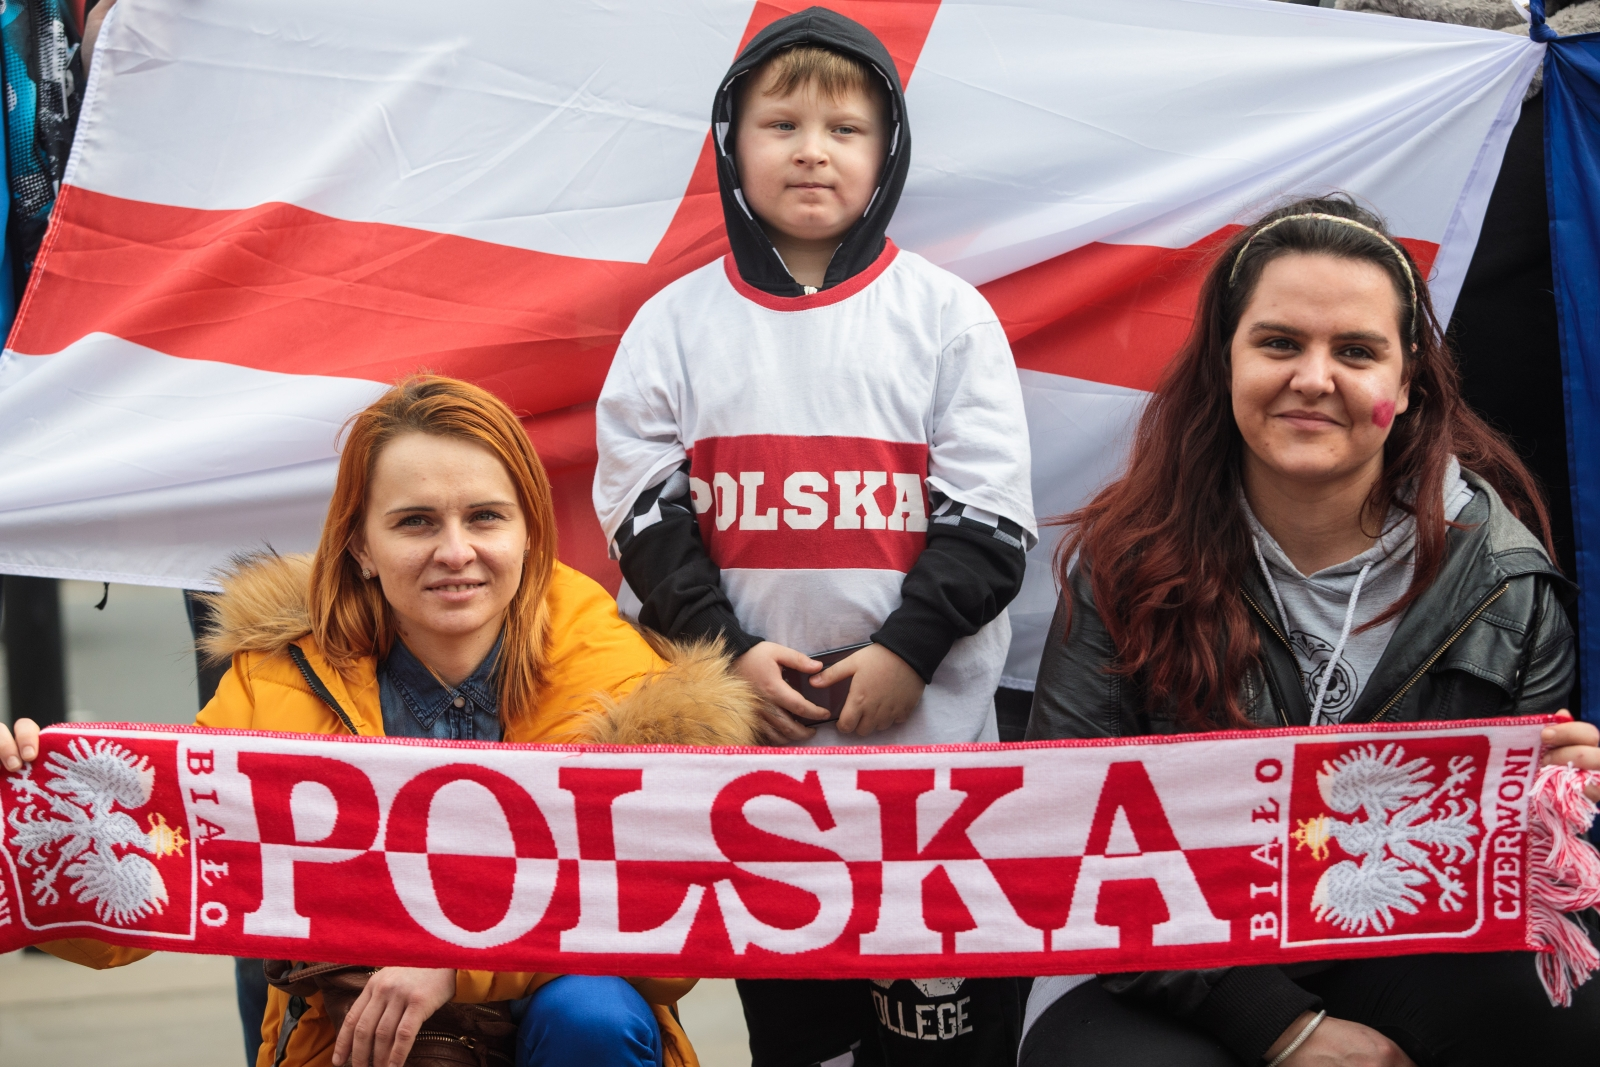 Polish migrants